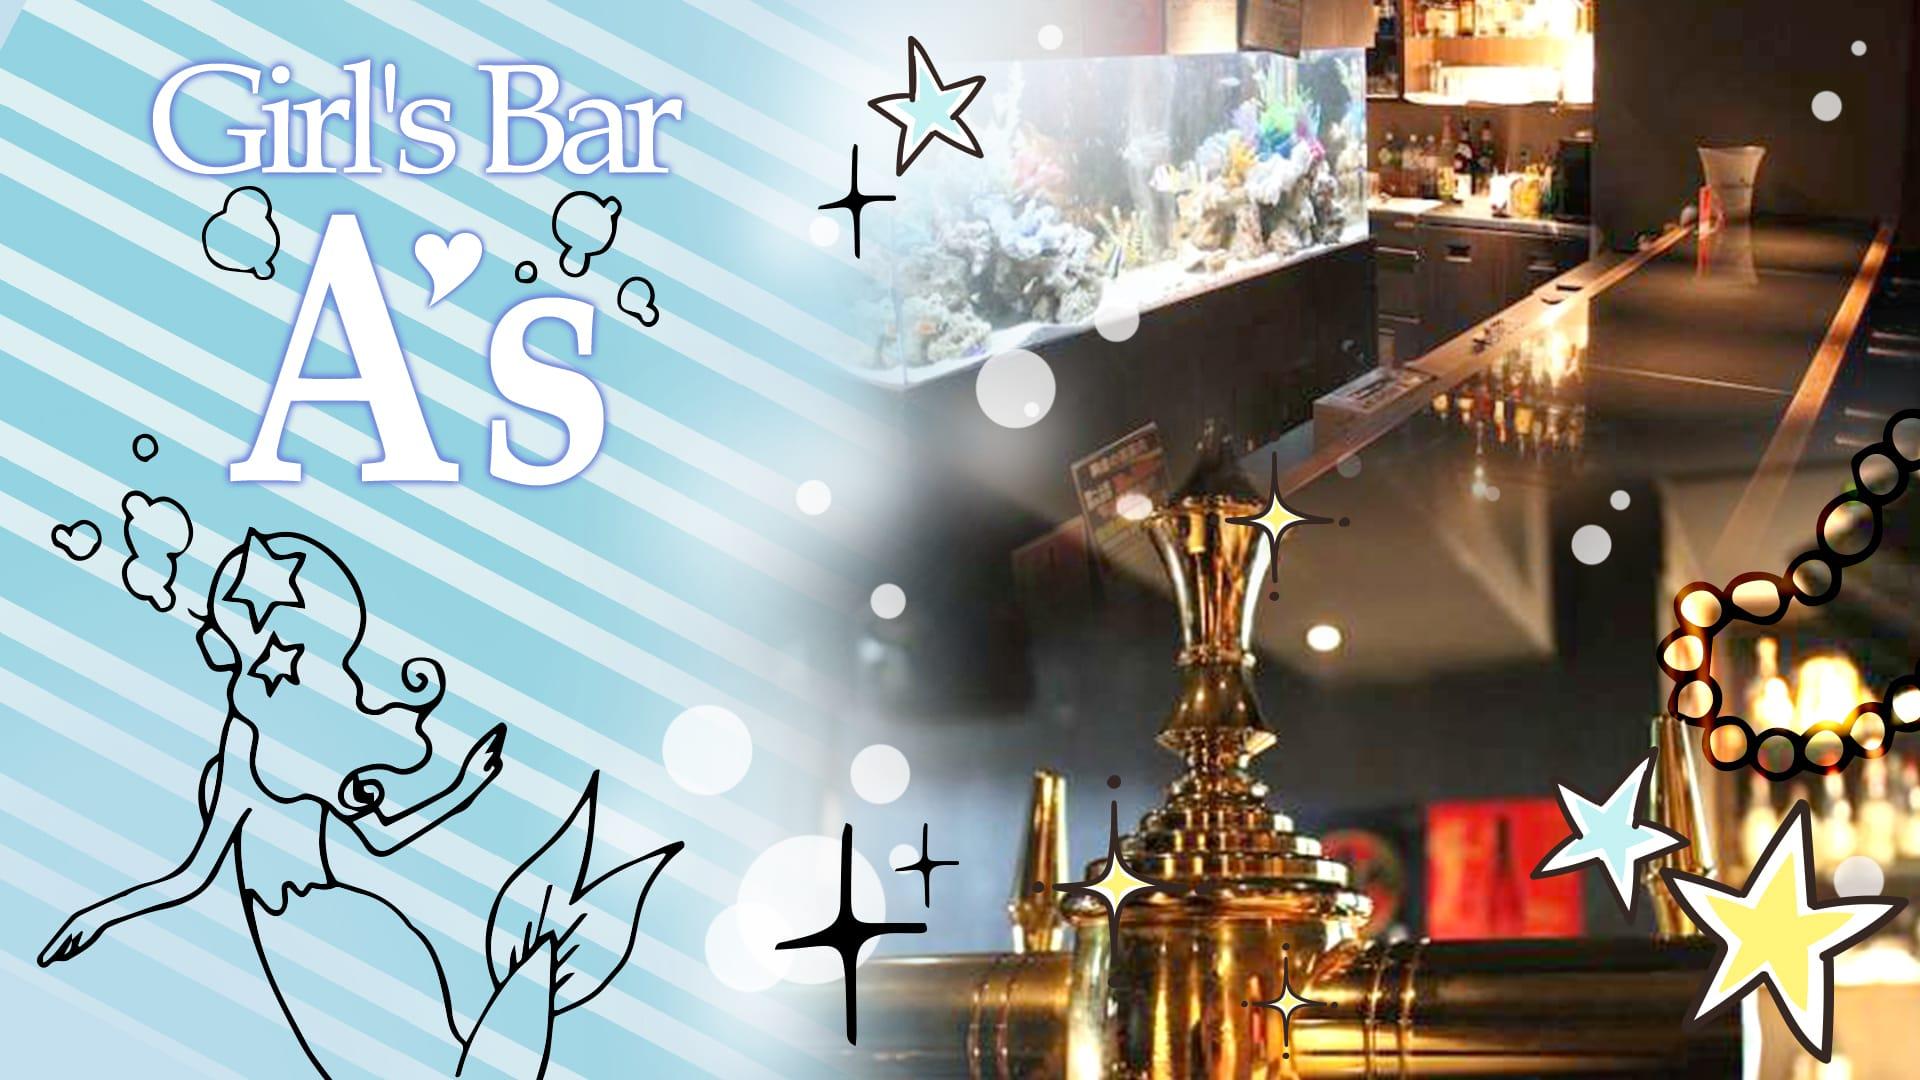 Girl's Bar A's~ガールズバーアズ~【公式求人情報 】 歌舞伎町ガールズバー TOP画像